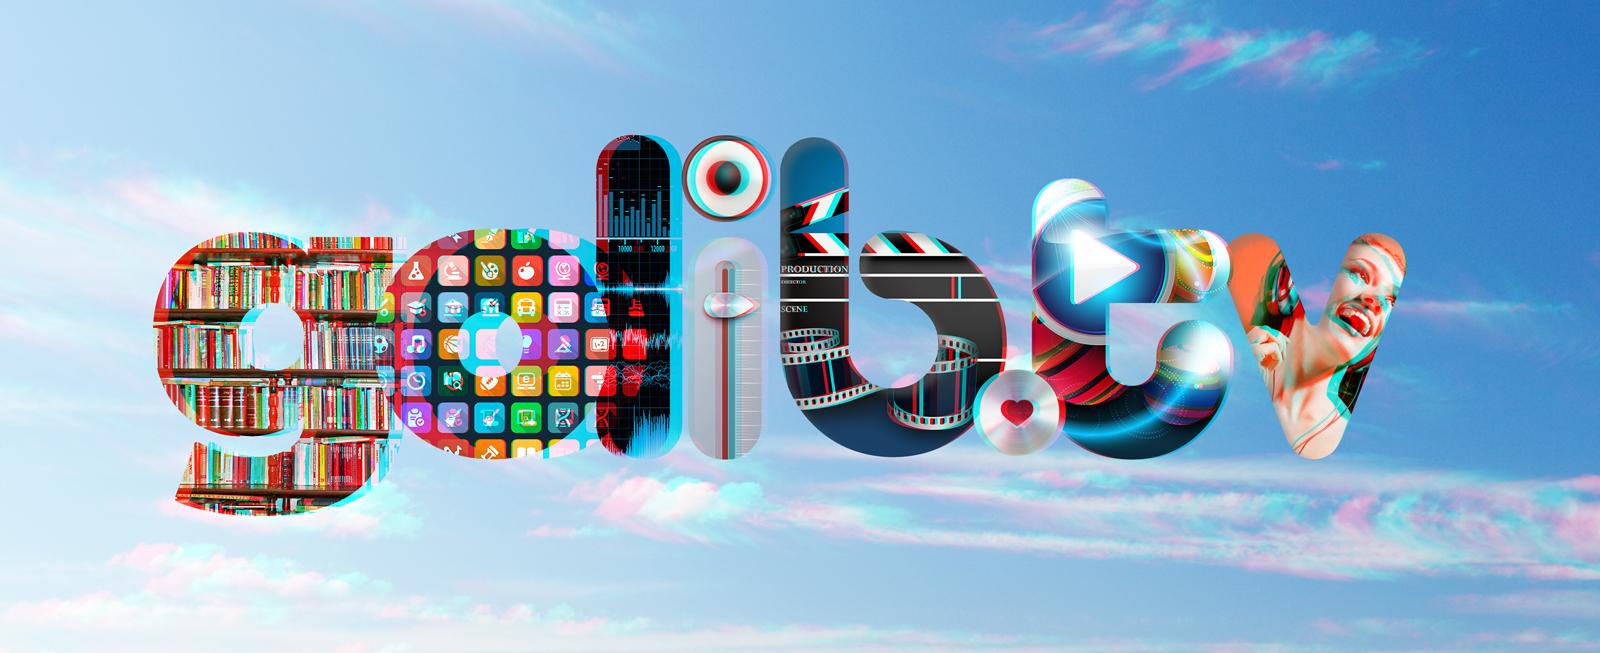 Golib.tv Typography 3D